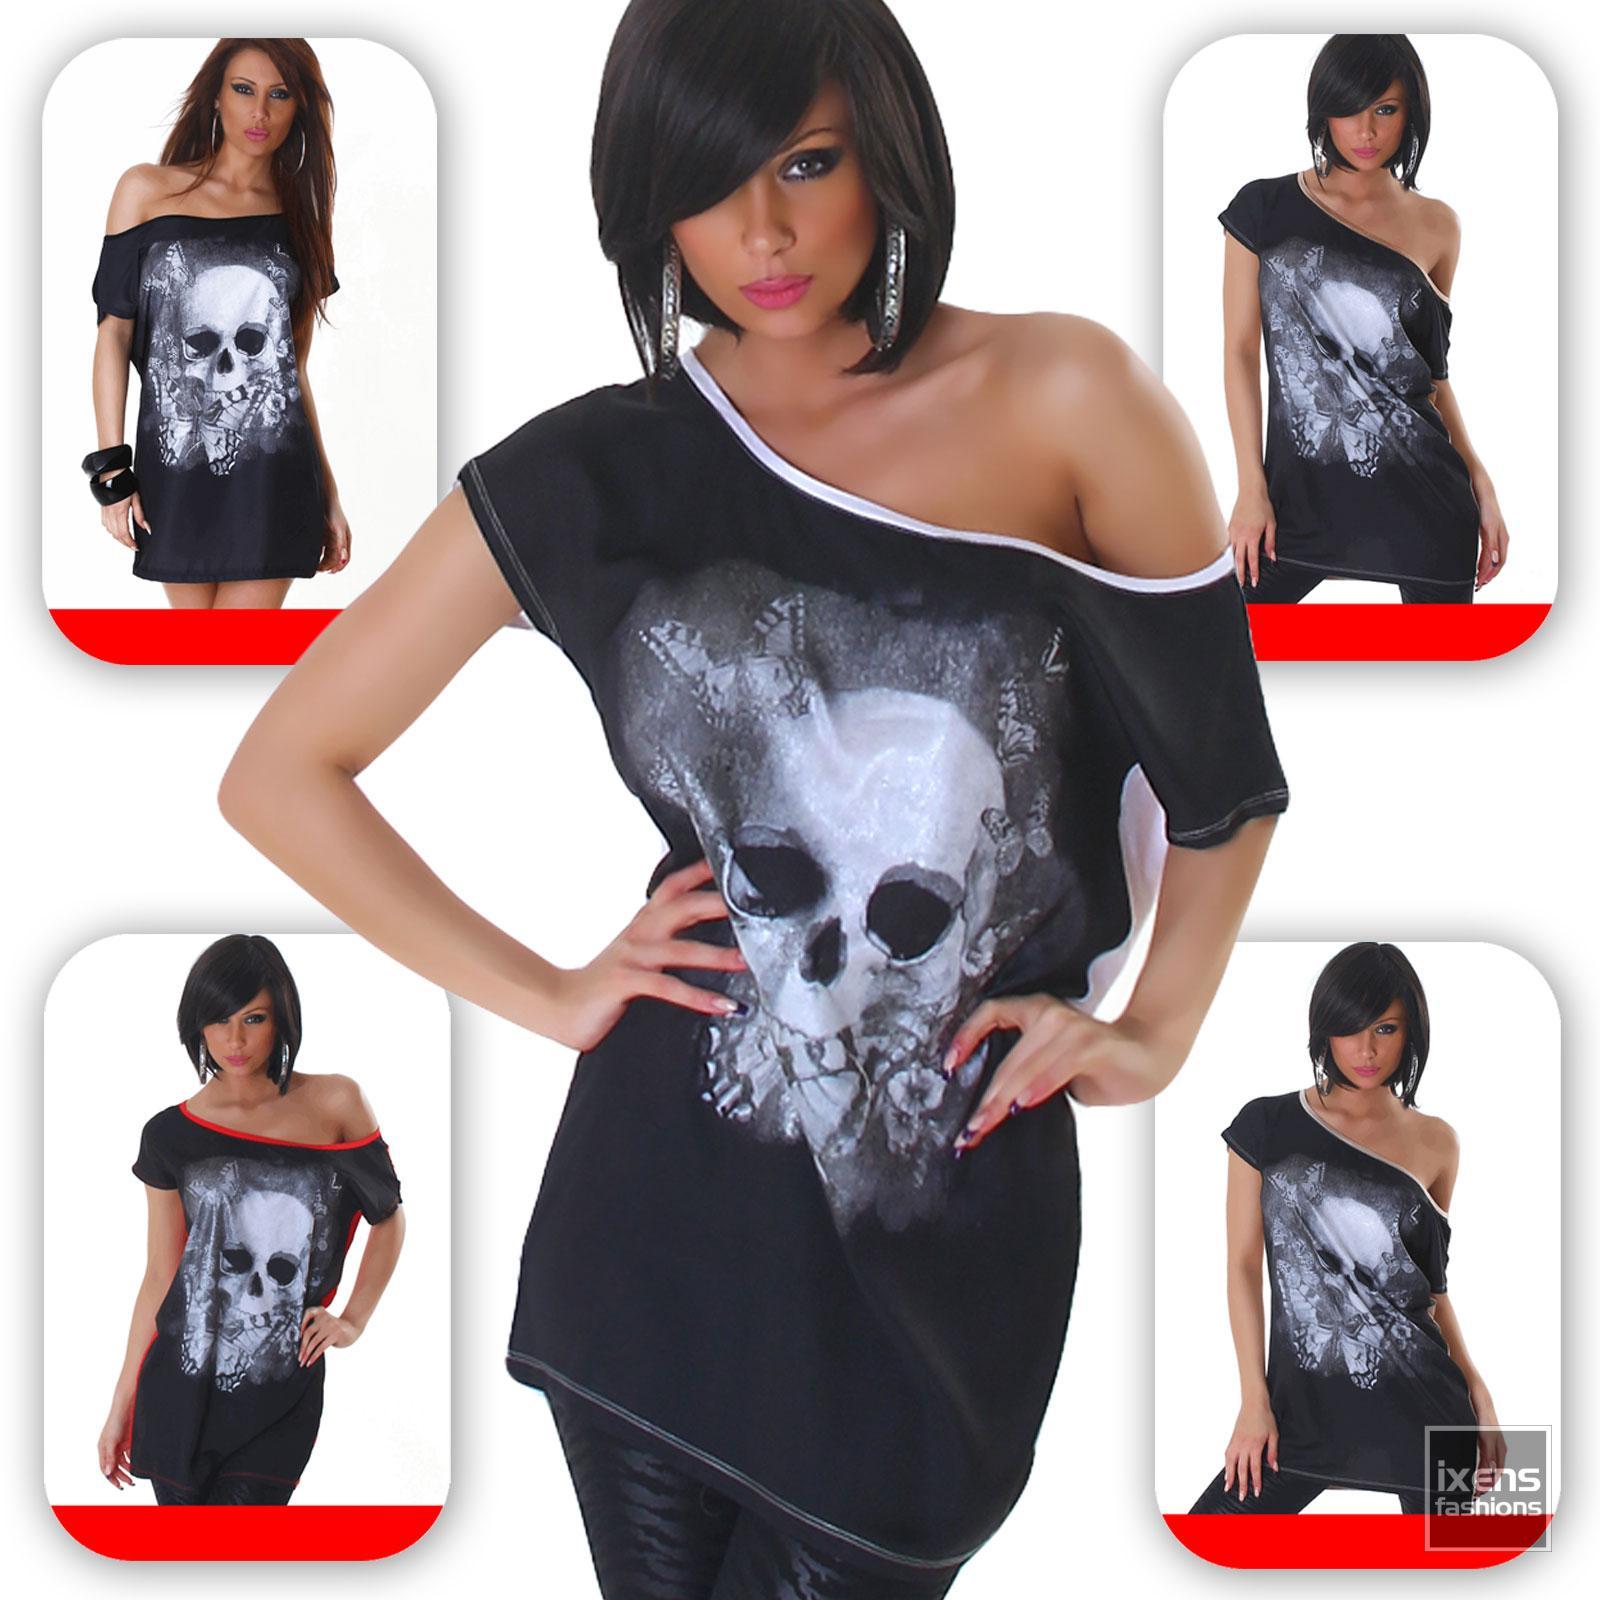 damen top shirt skull totenkopf 34 36 38 40 t shirt ebay. Black Bedroom Furniture Sets. Home Design Ideas